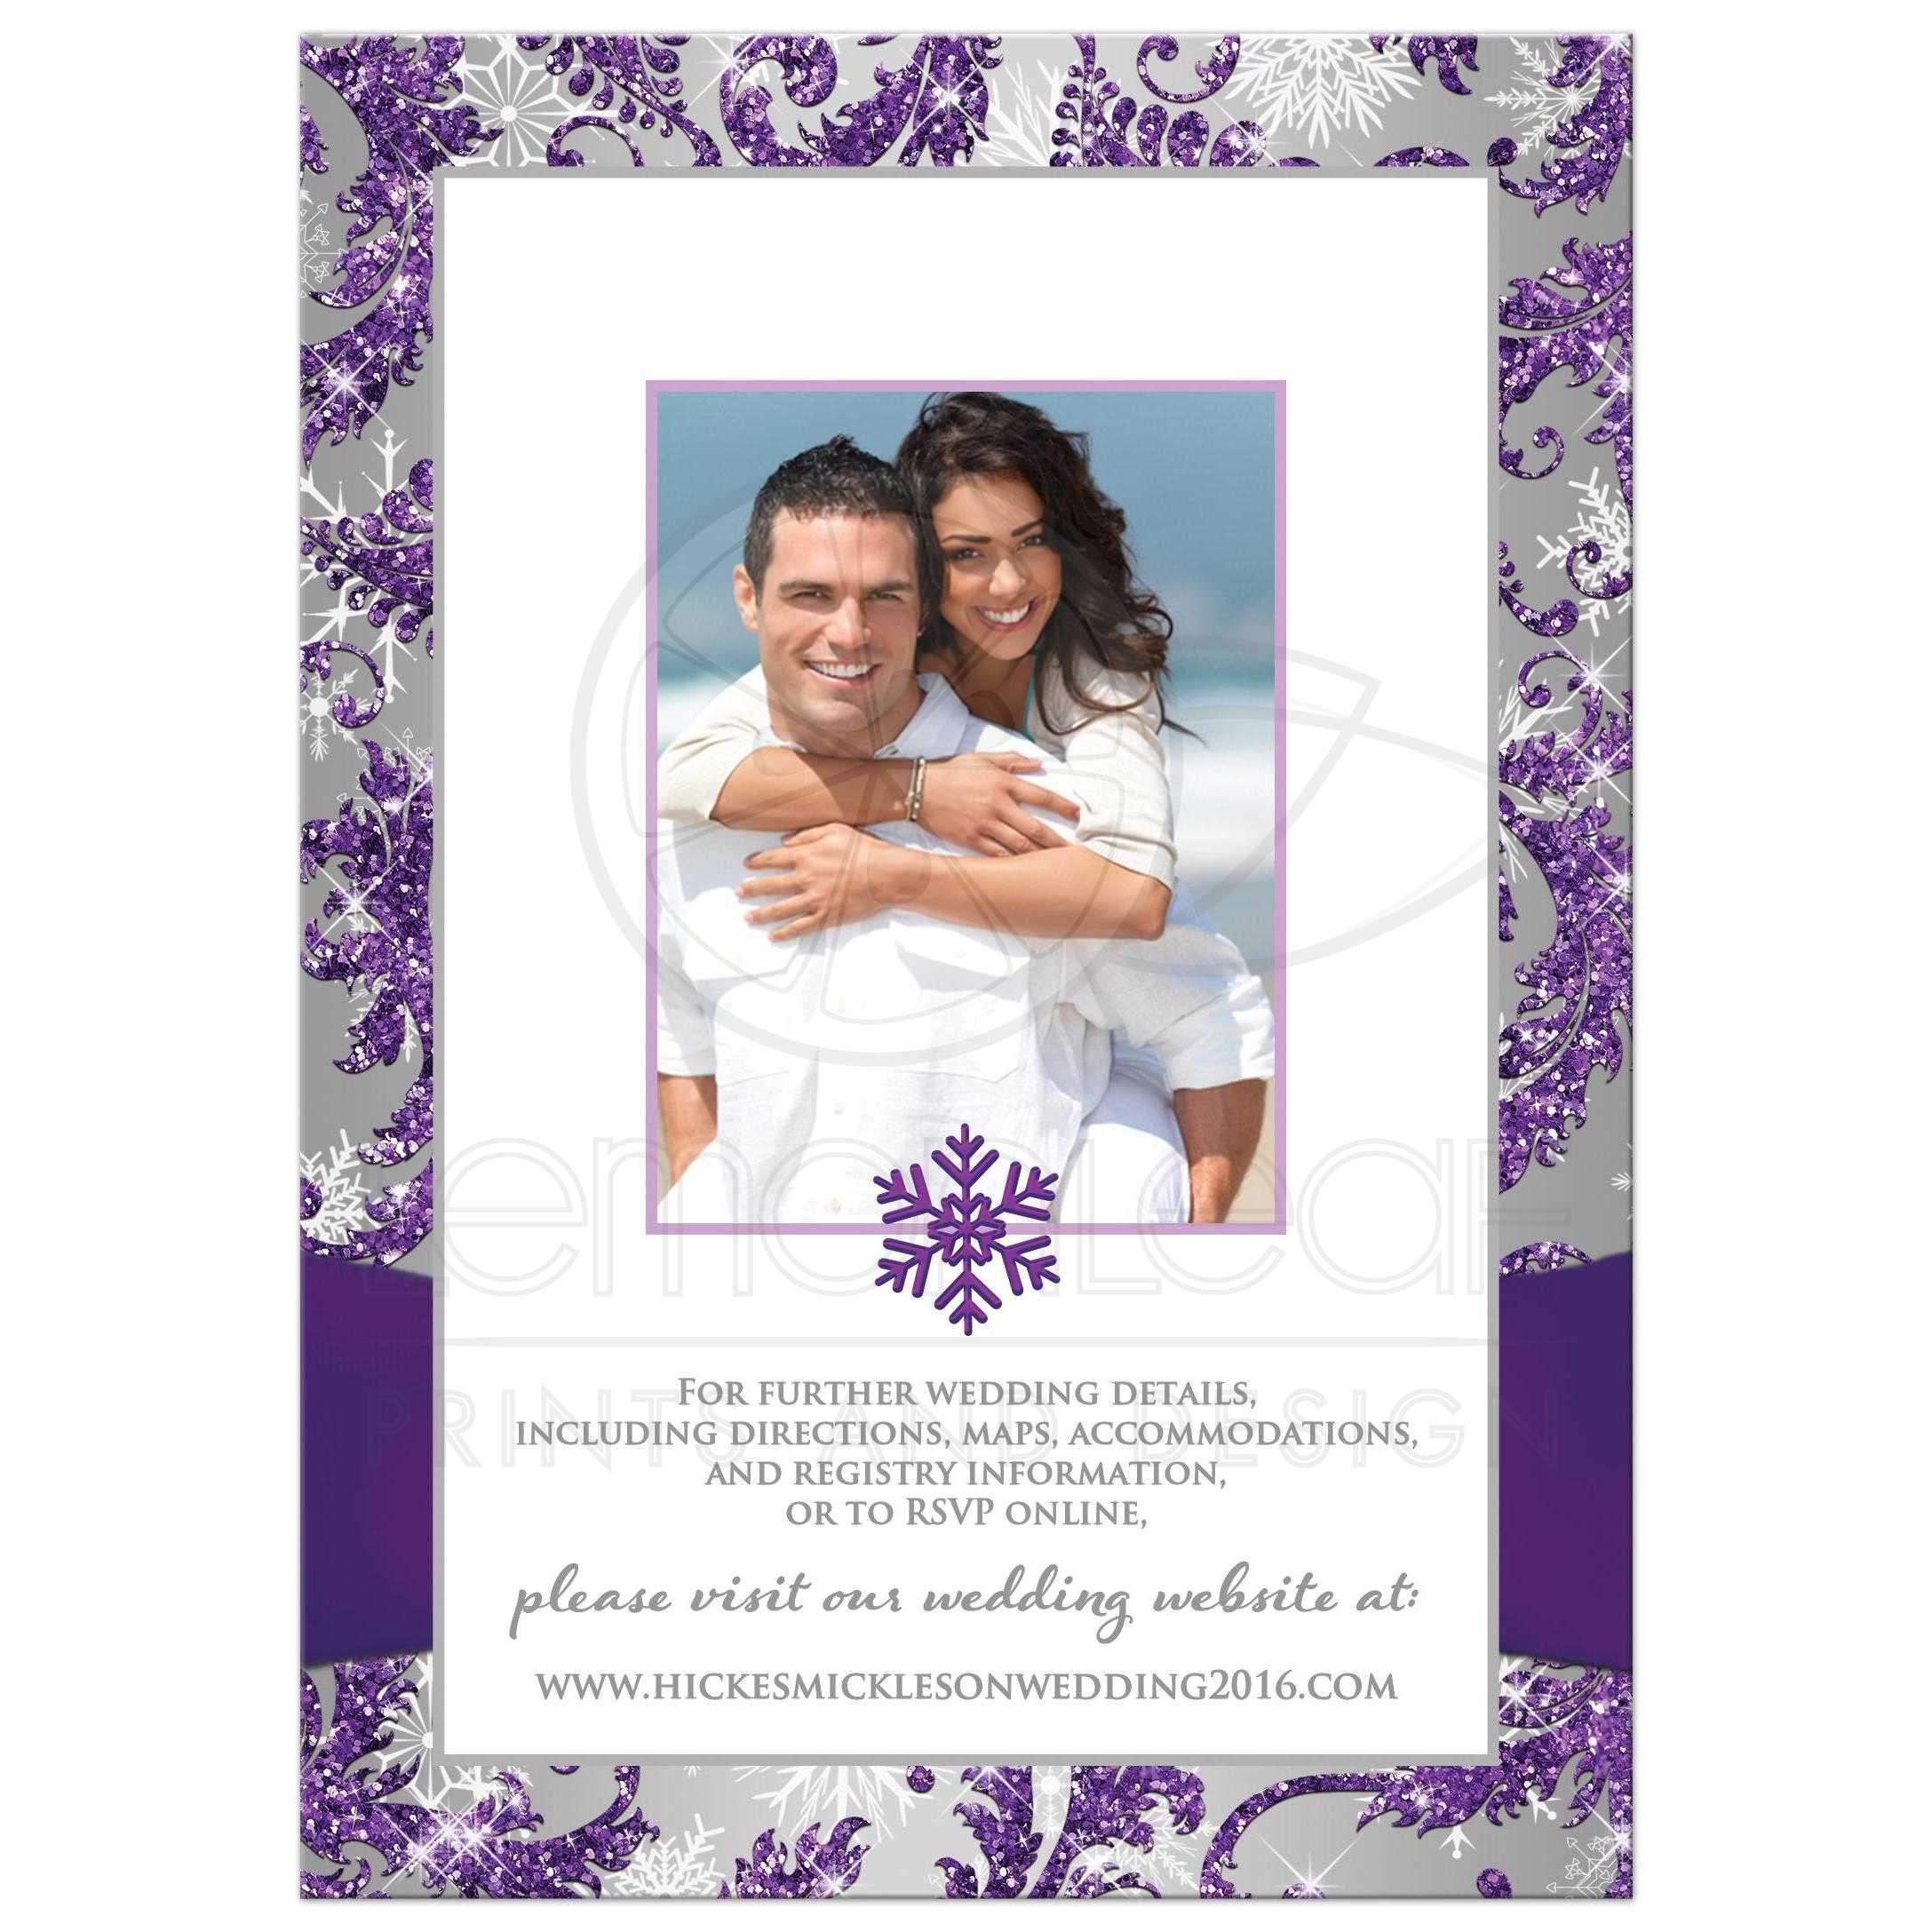 ... Winter Wonderland Wedding Invite With Photo Template In Ice Purple,  Silver, ...